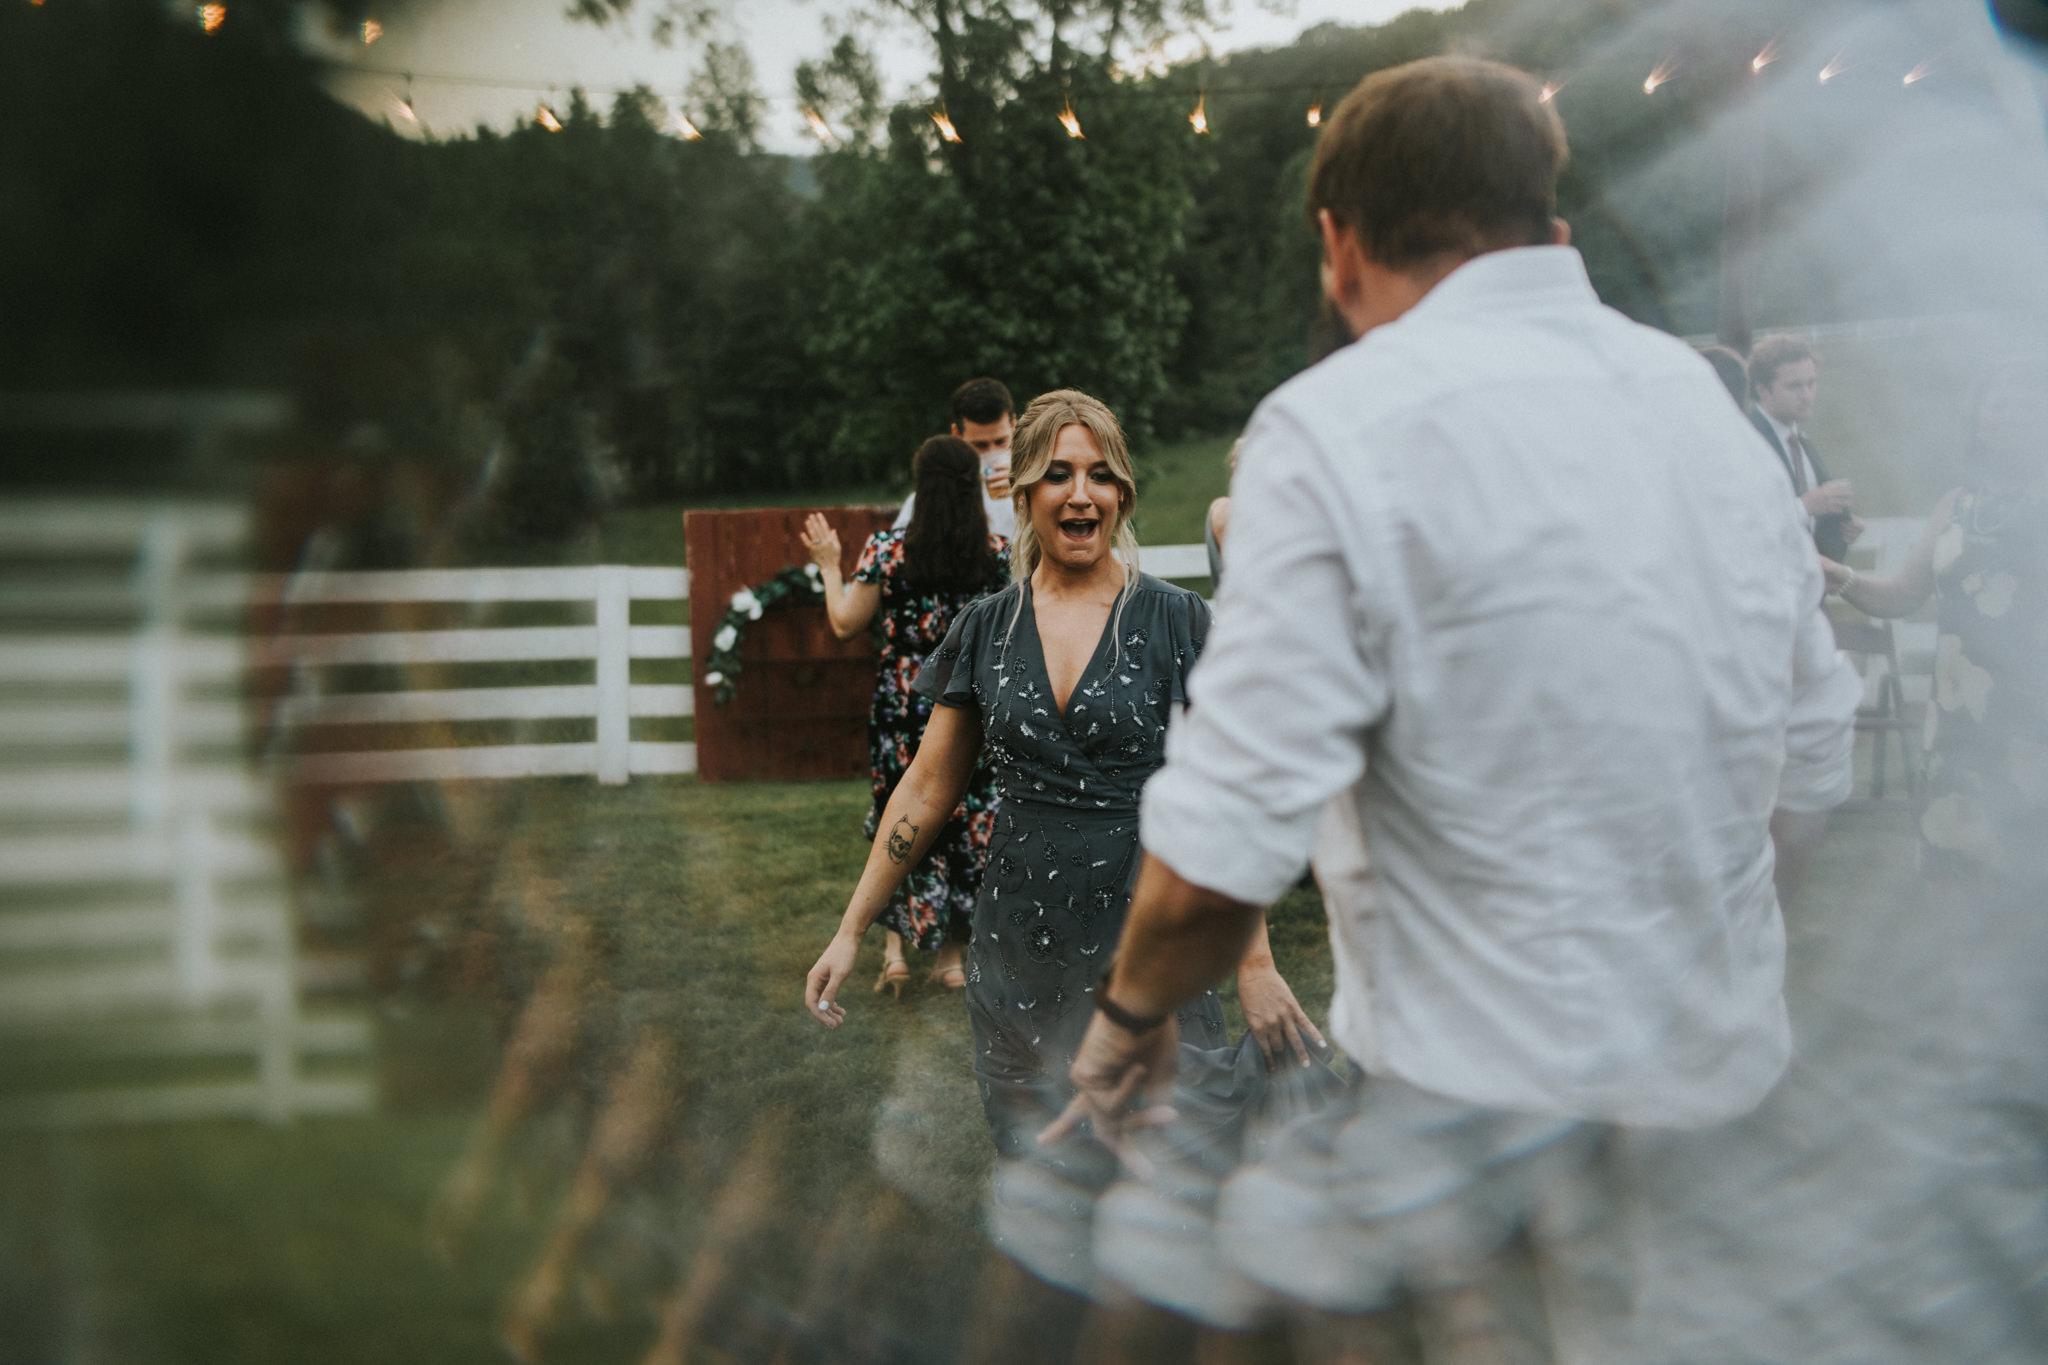 KateMatt-North-Georgia-Wedding-Photographer-Mountain-Laurel-Farm-155.jpg